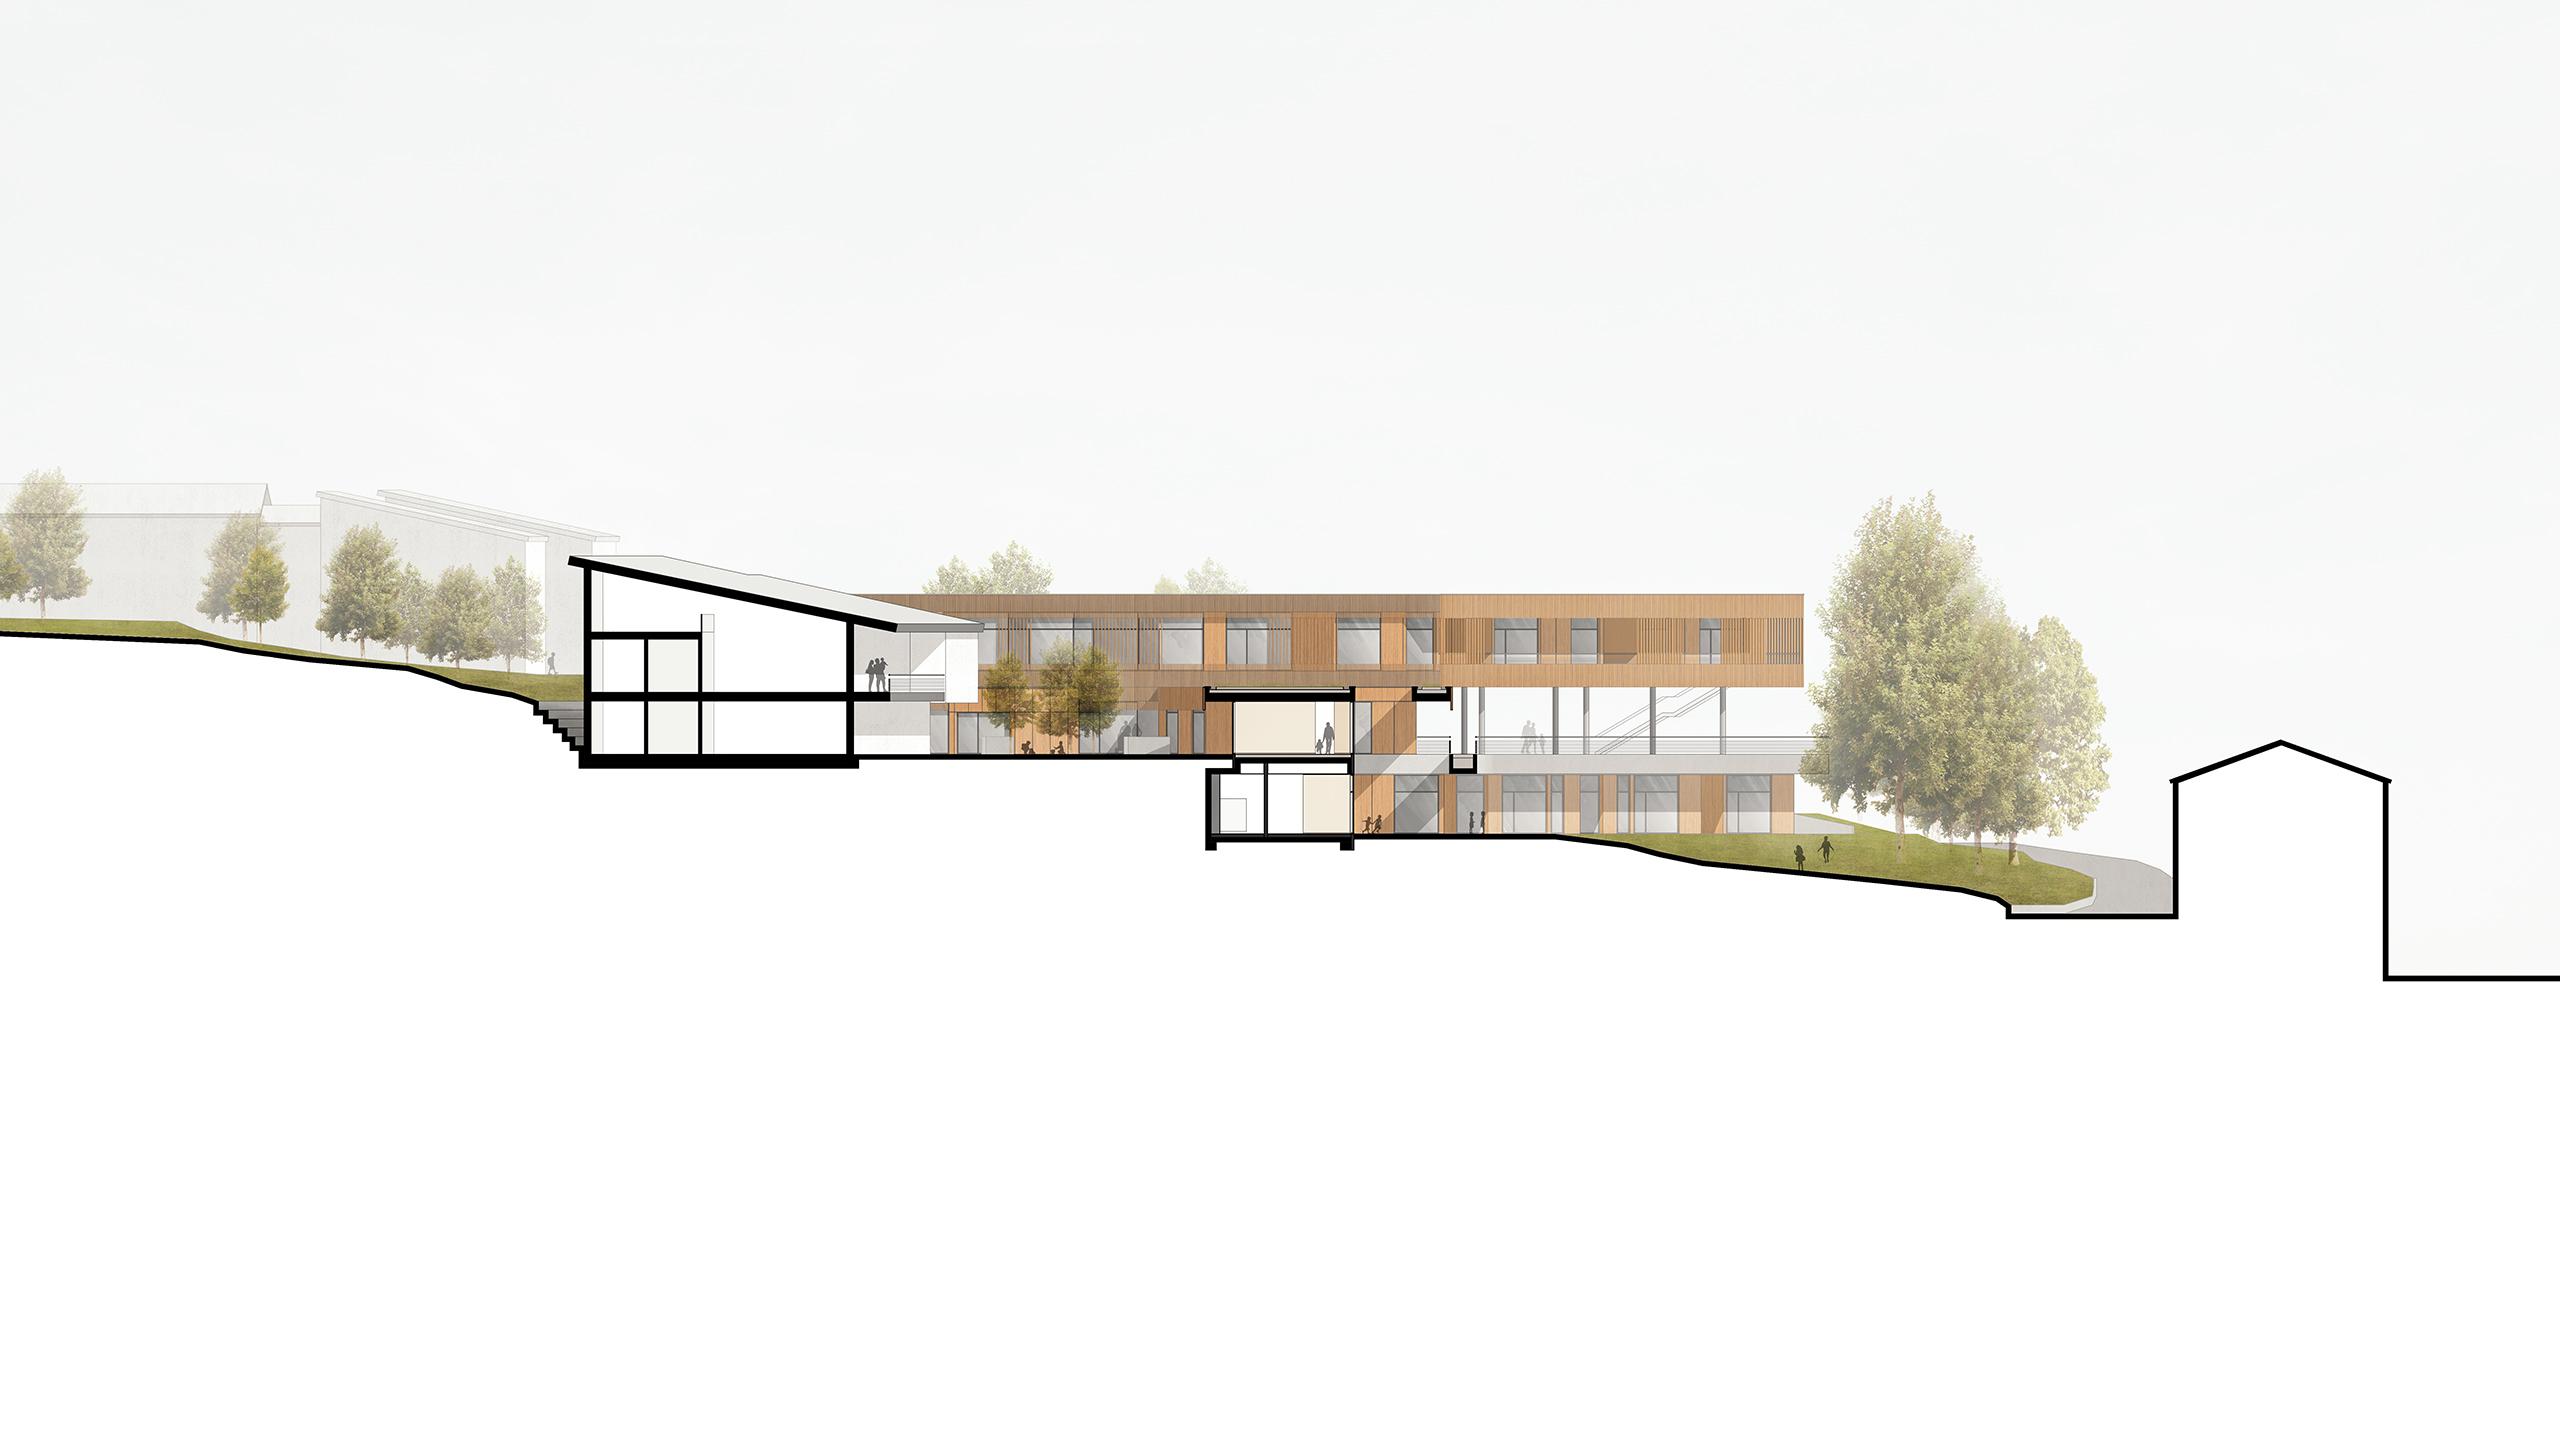 KIta Architektur